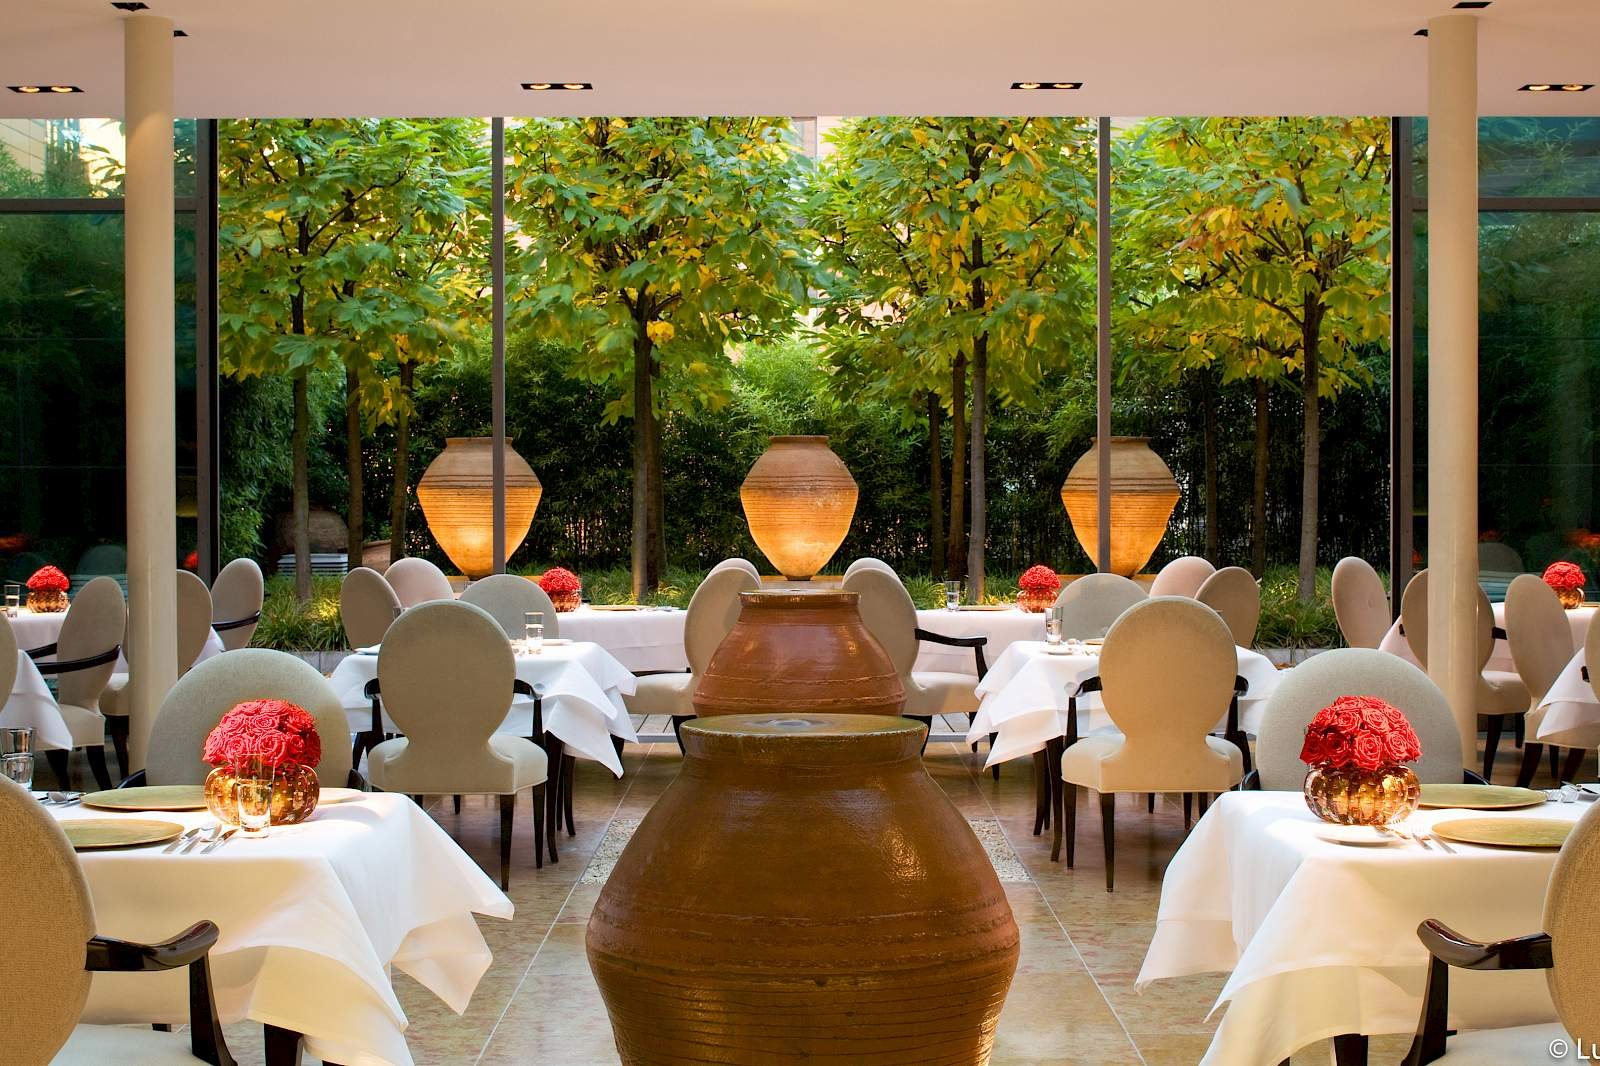 2 Sterne Restaurant im The Mandala Hotel | Restaurant FACIL